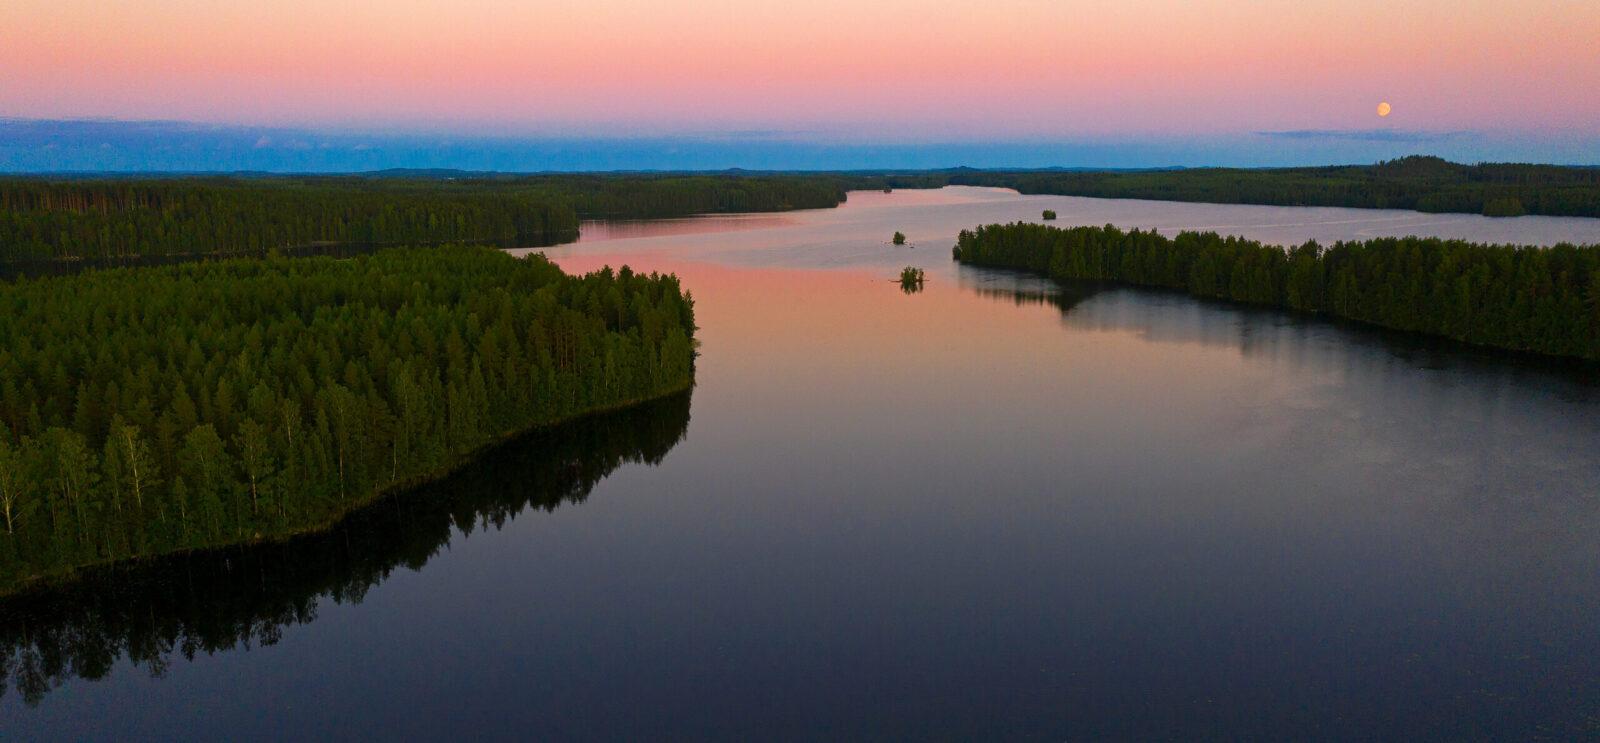 Loojang järve ääres